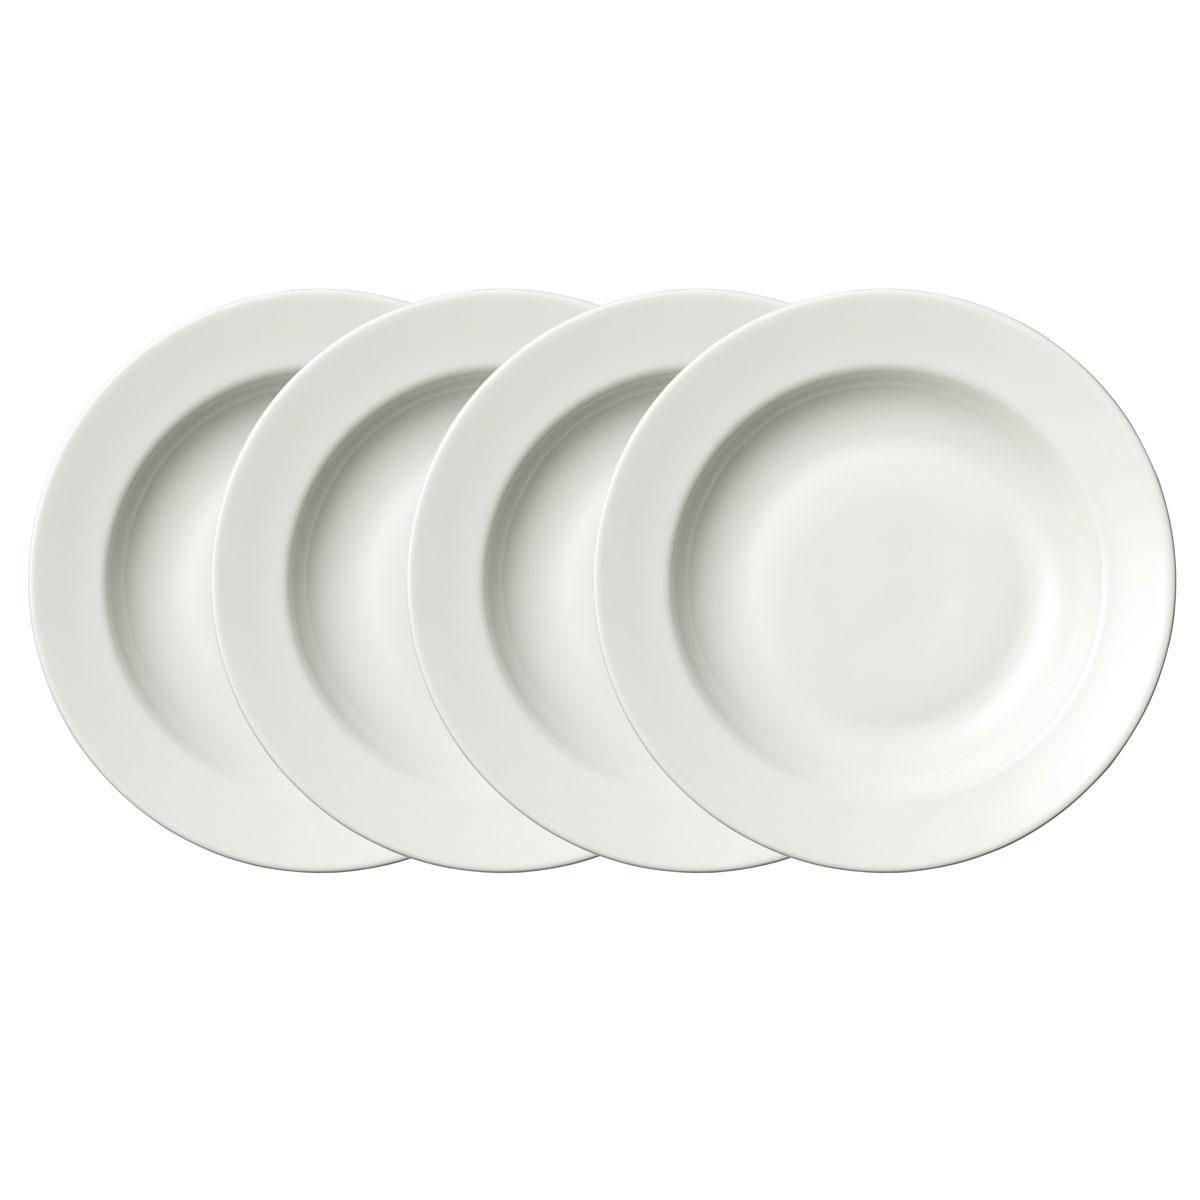 Vera Wang Wedgwood Bone China Perfect White Rim Soup Set of Four